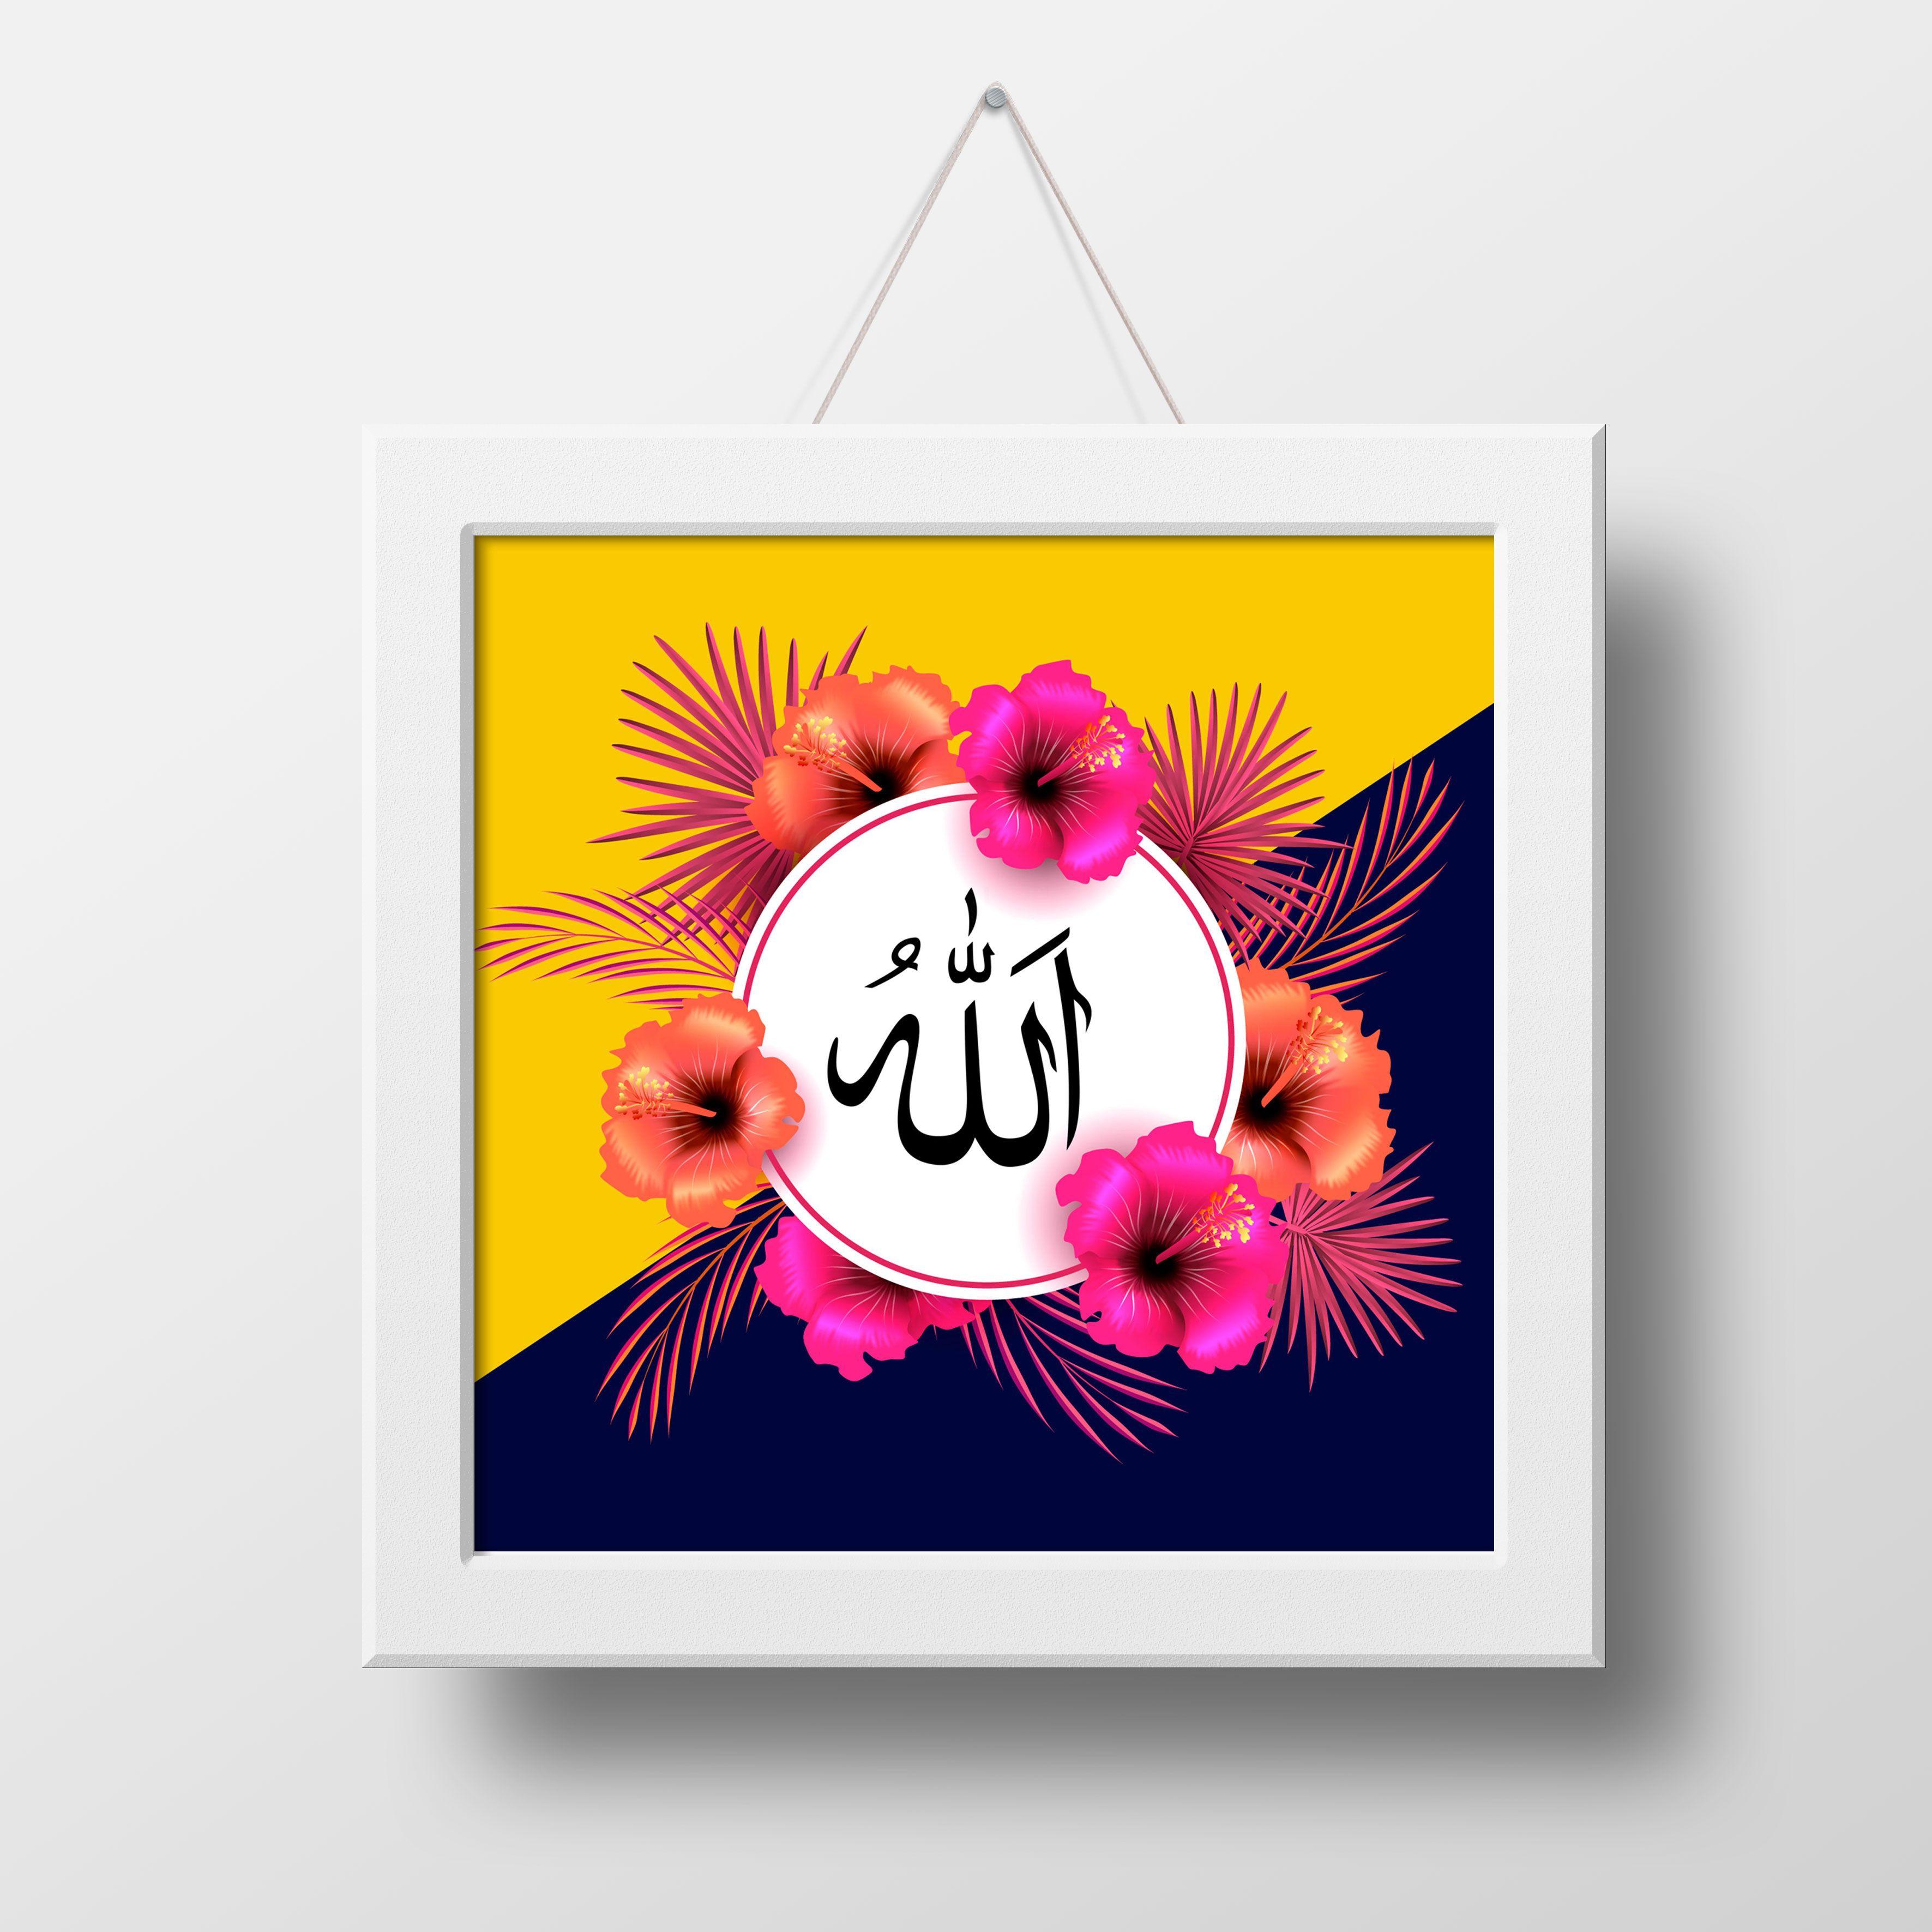 Wa 081 946 542 871 Tulisan Allah Kaligrafi Tulisan Allah Kareem Tulisan Allah Karim Poster Dinding Gambar Menakjubkan